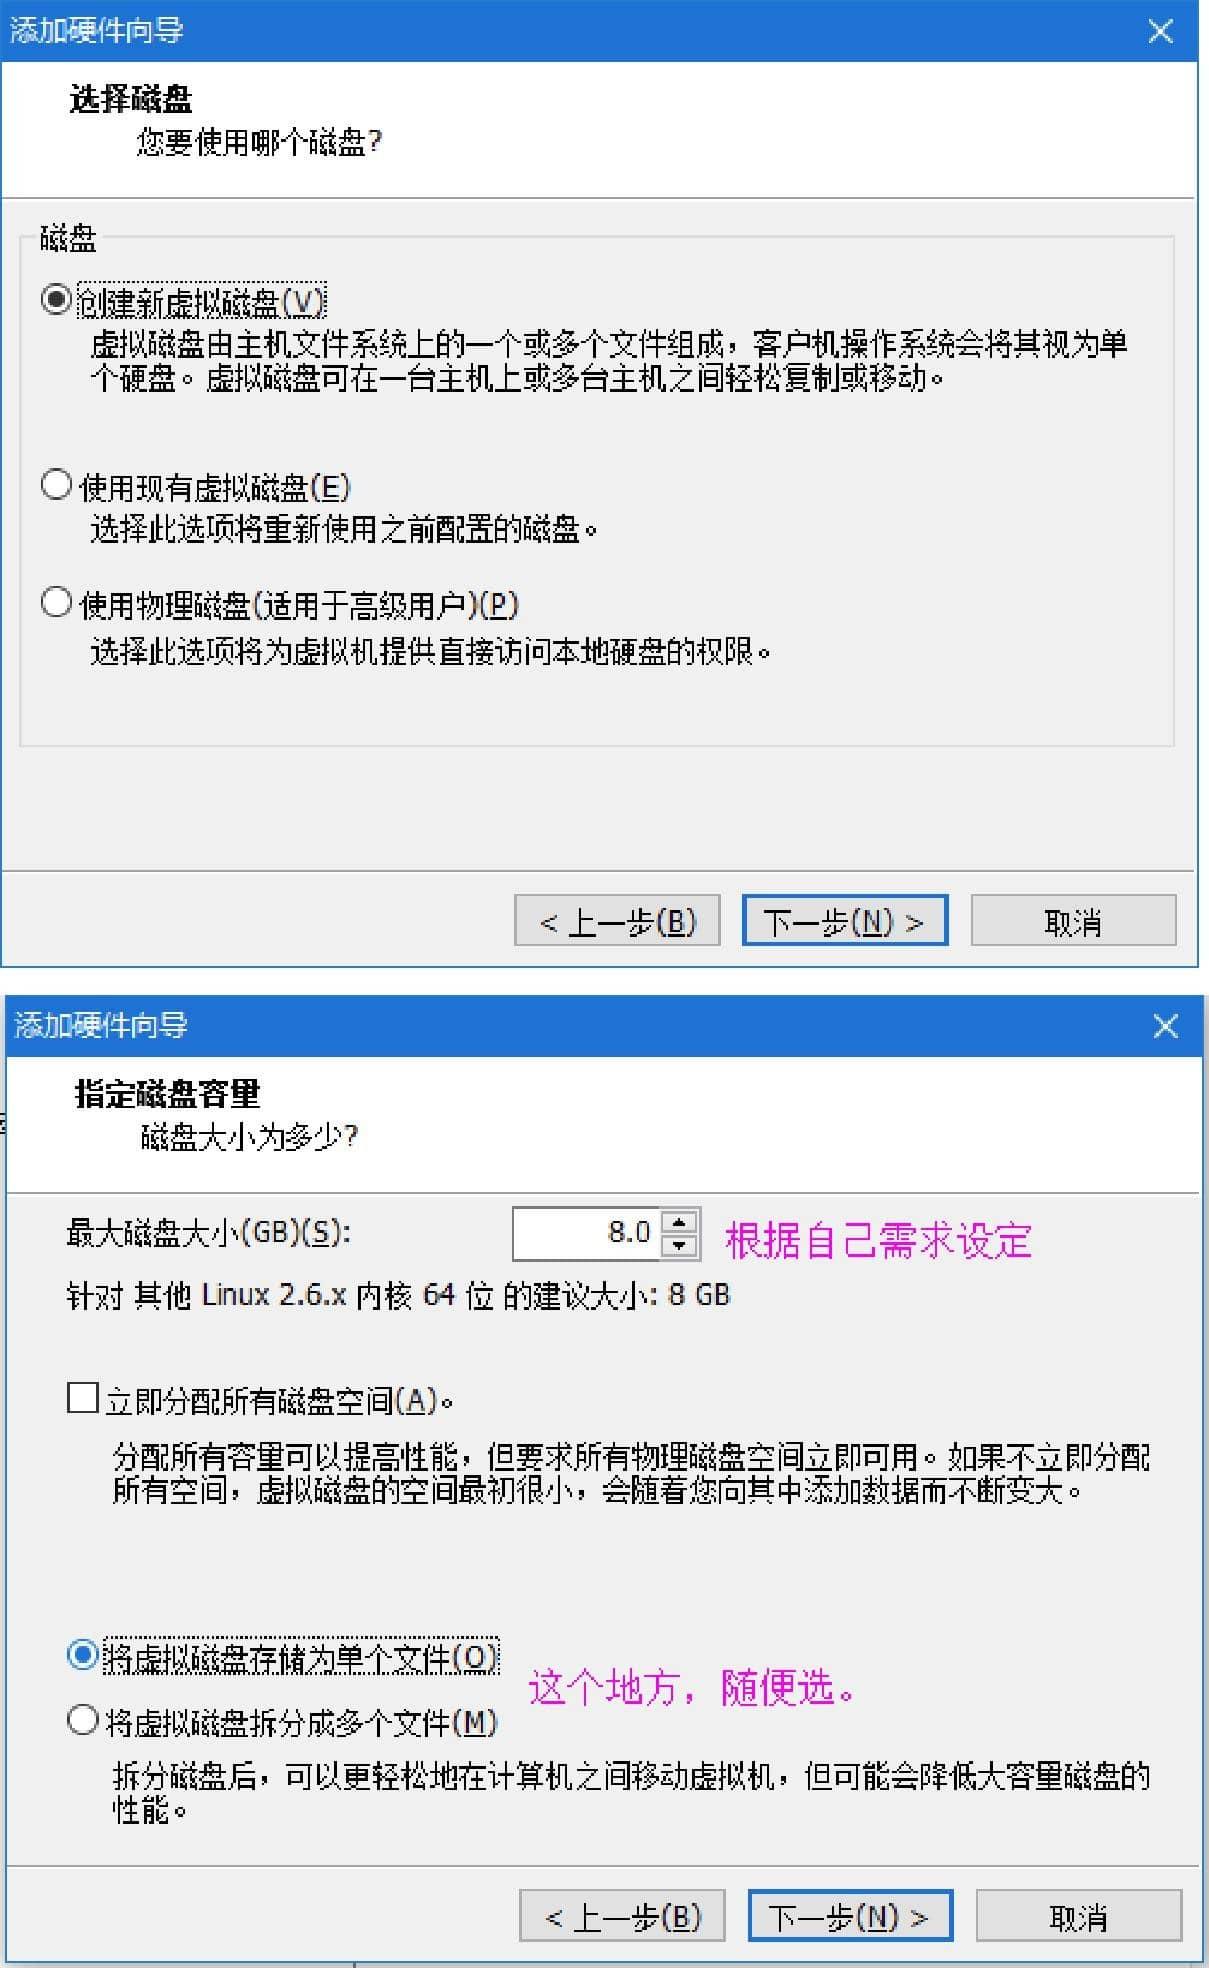 VMWare虚拟机安装黑群晖 (DSM6.1) 教程 第17张